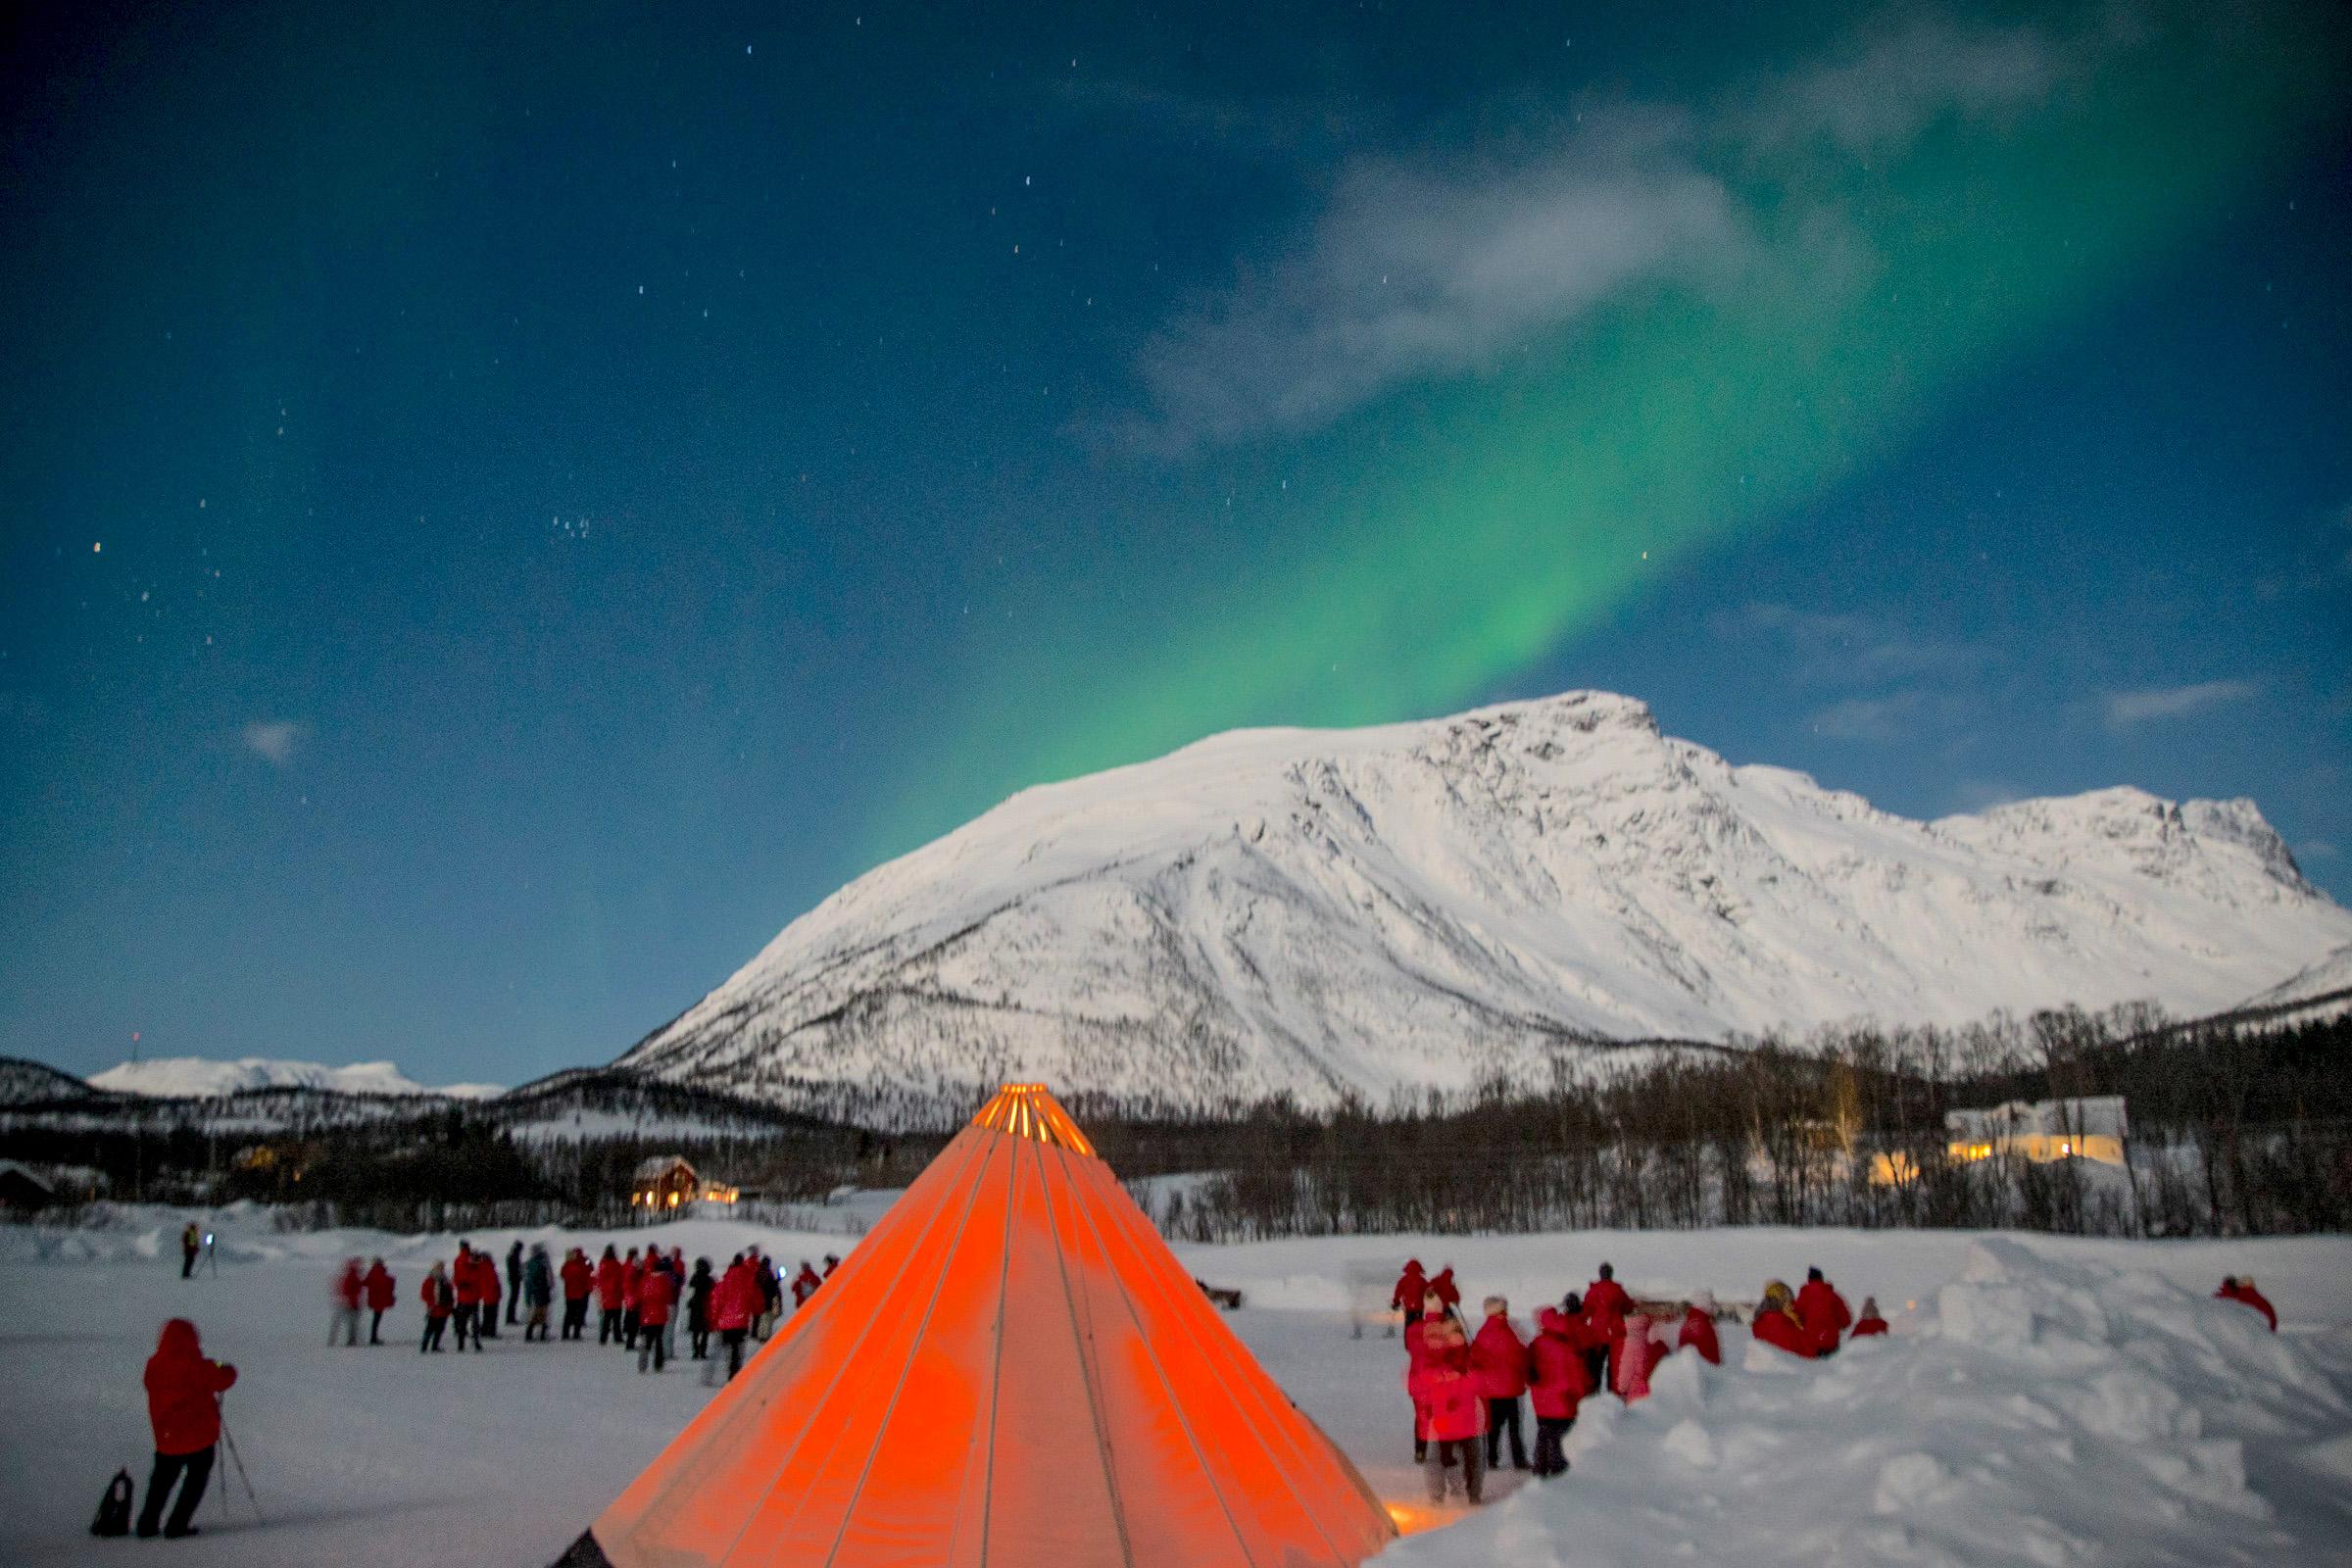 26 Sami tent and the Aurora.jpg